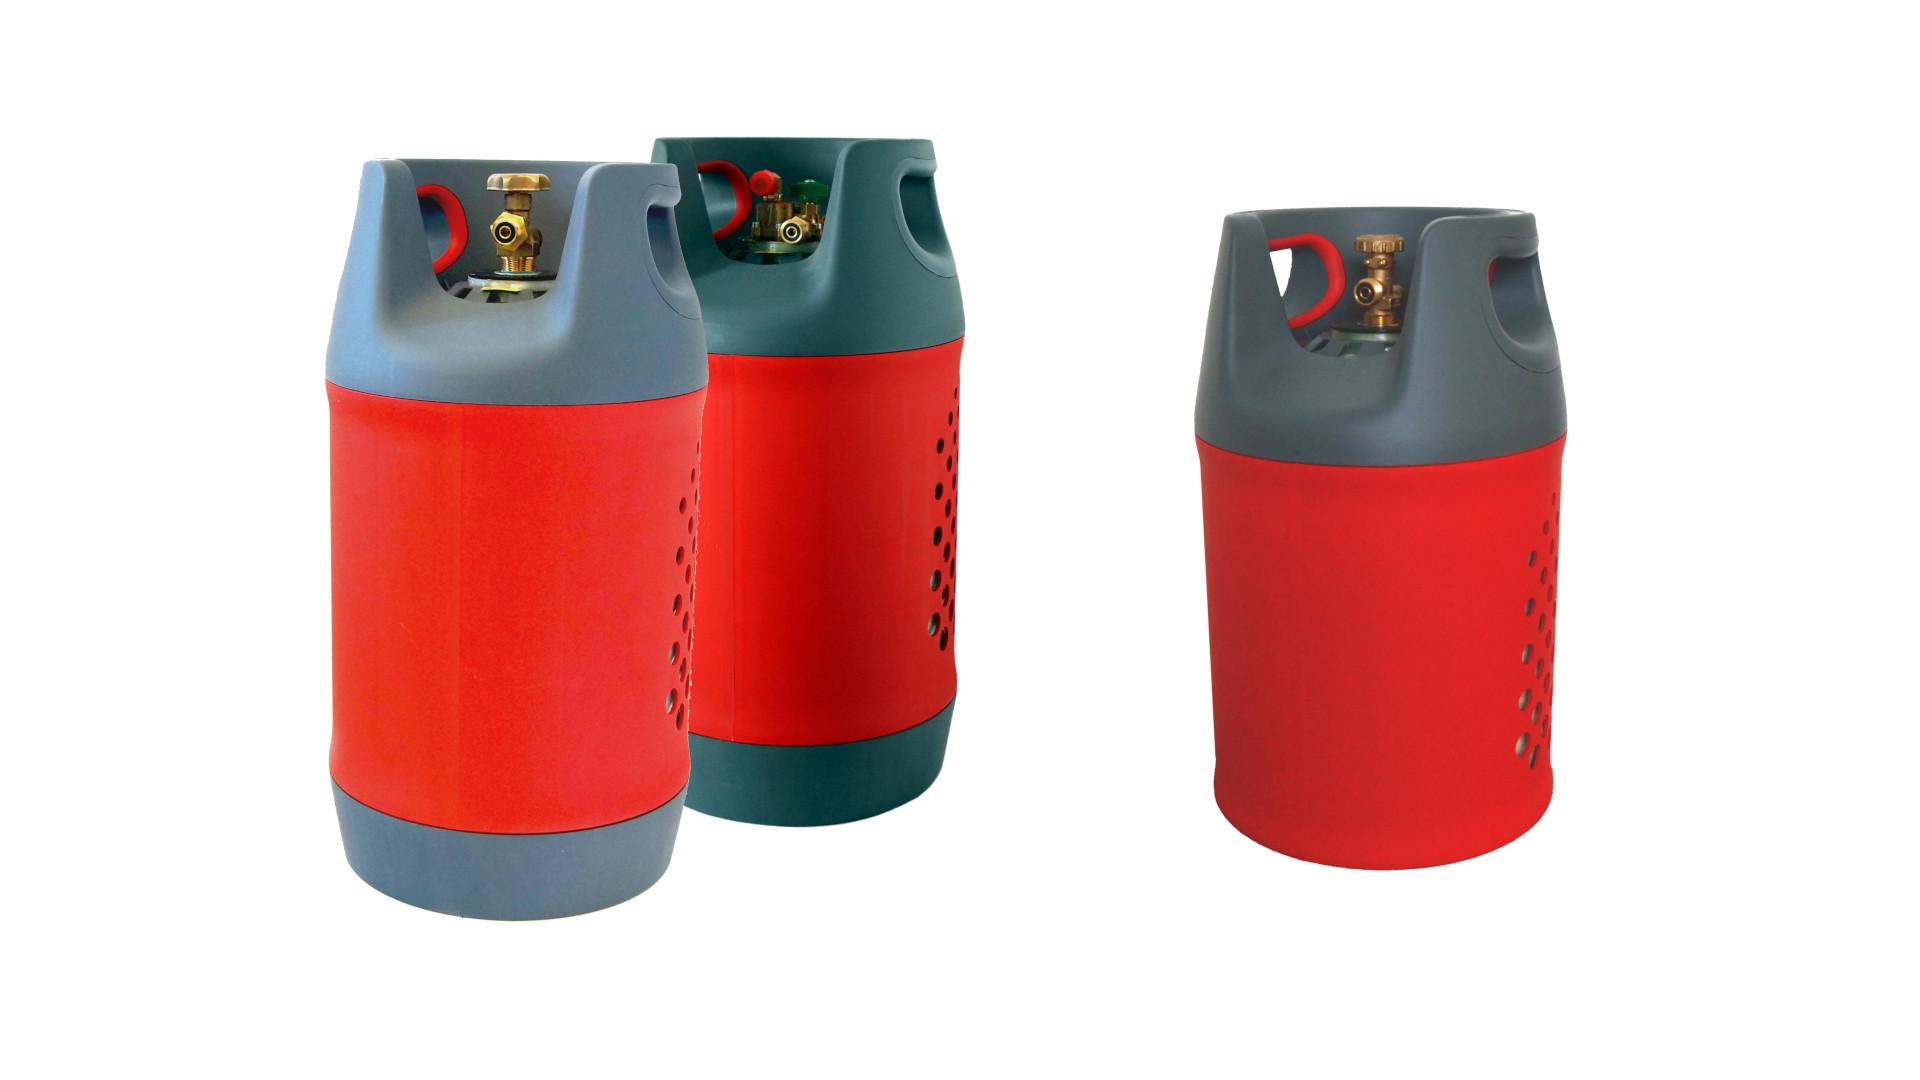 Cilindros de gas de composite